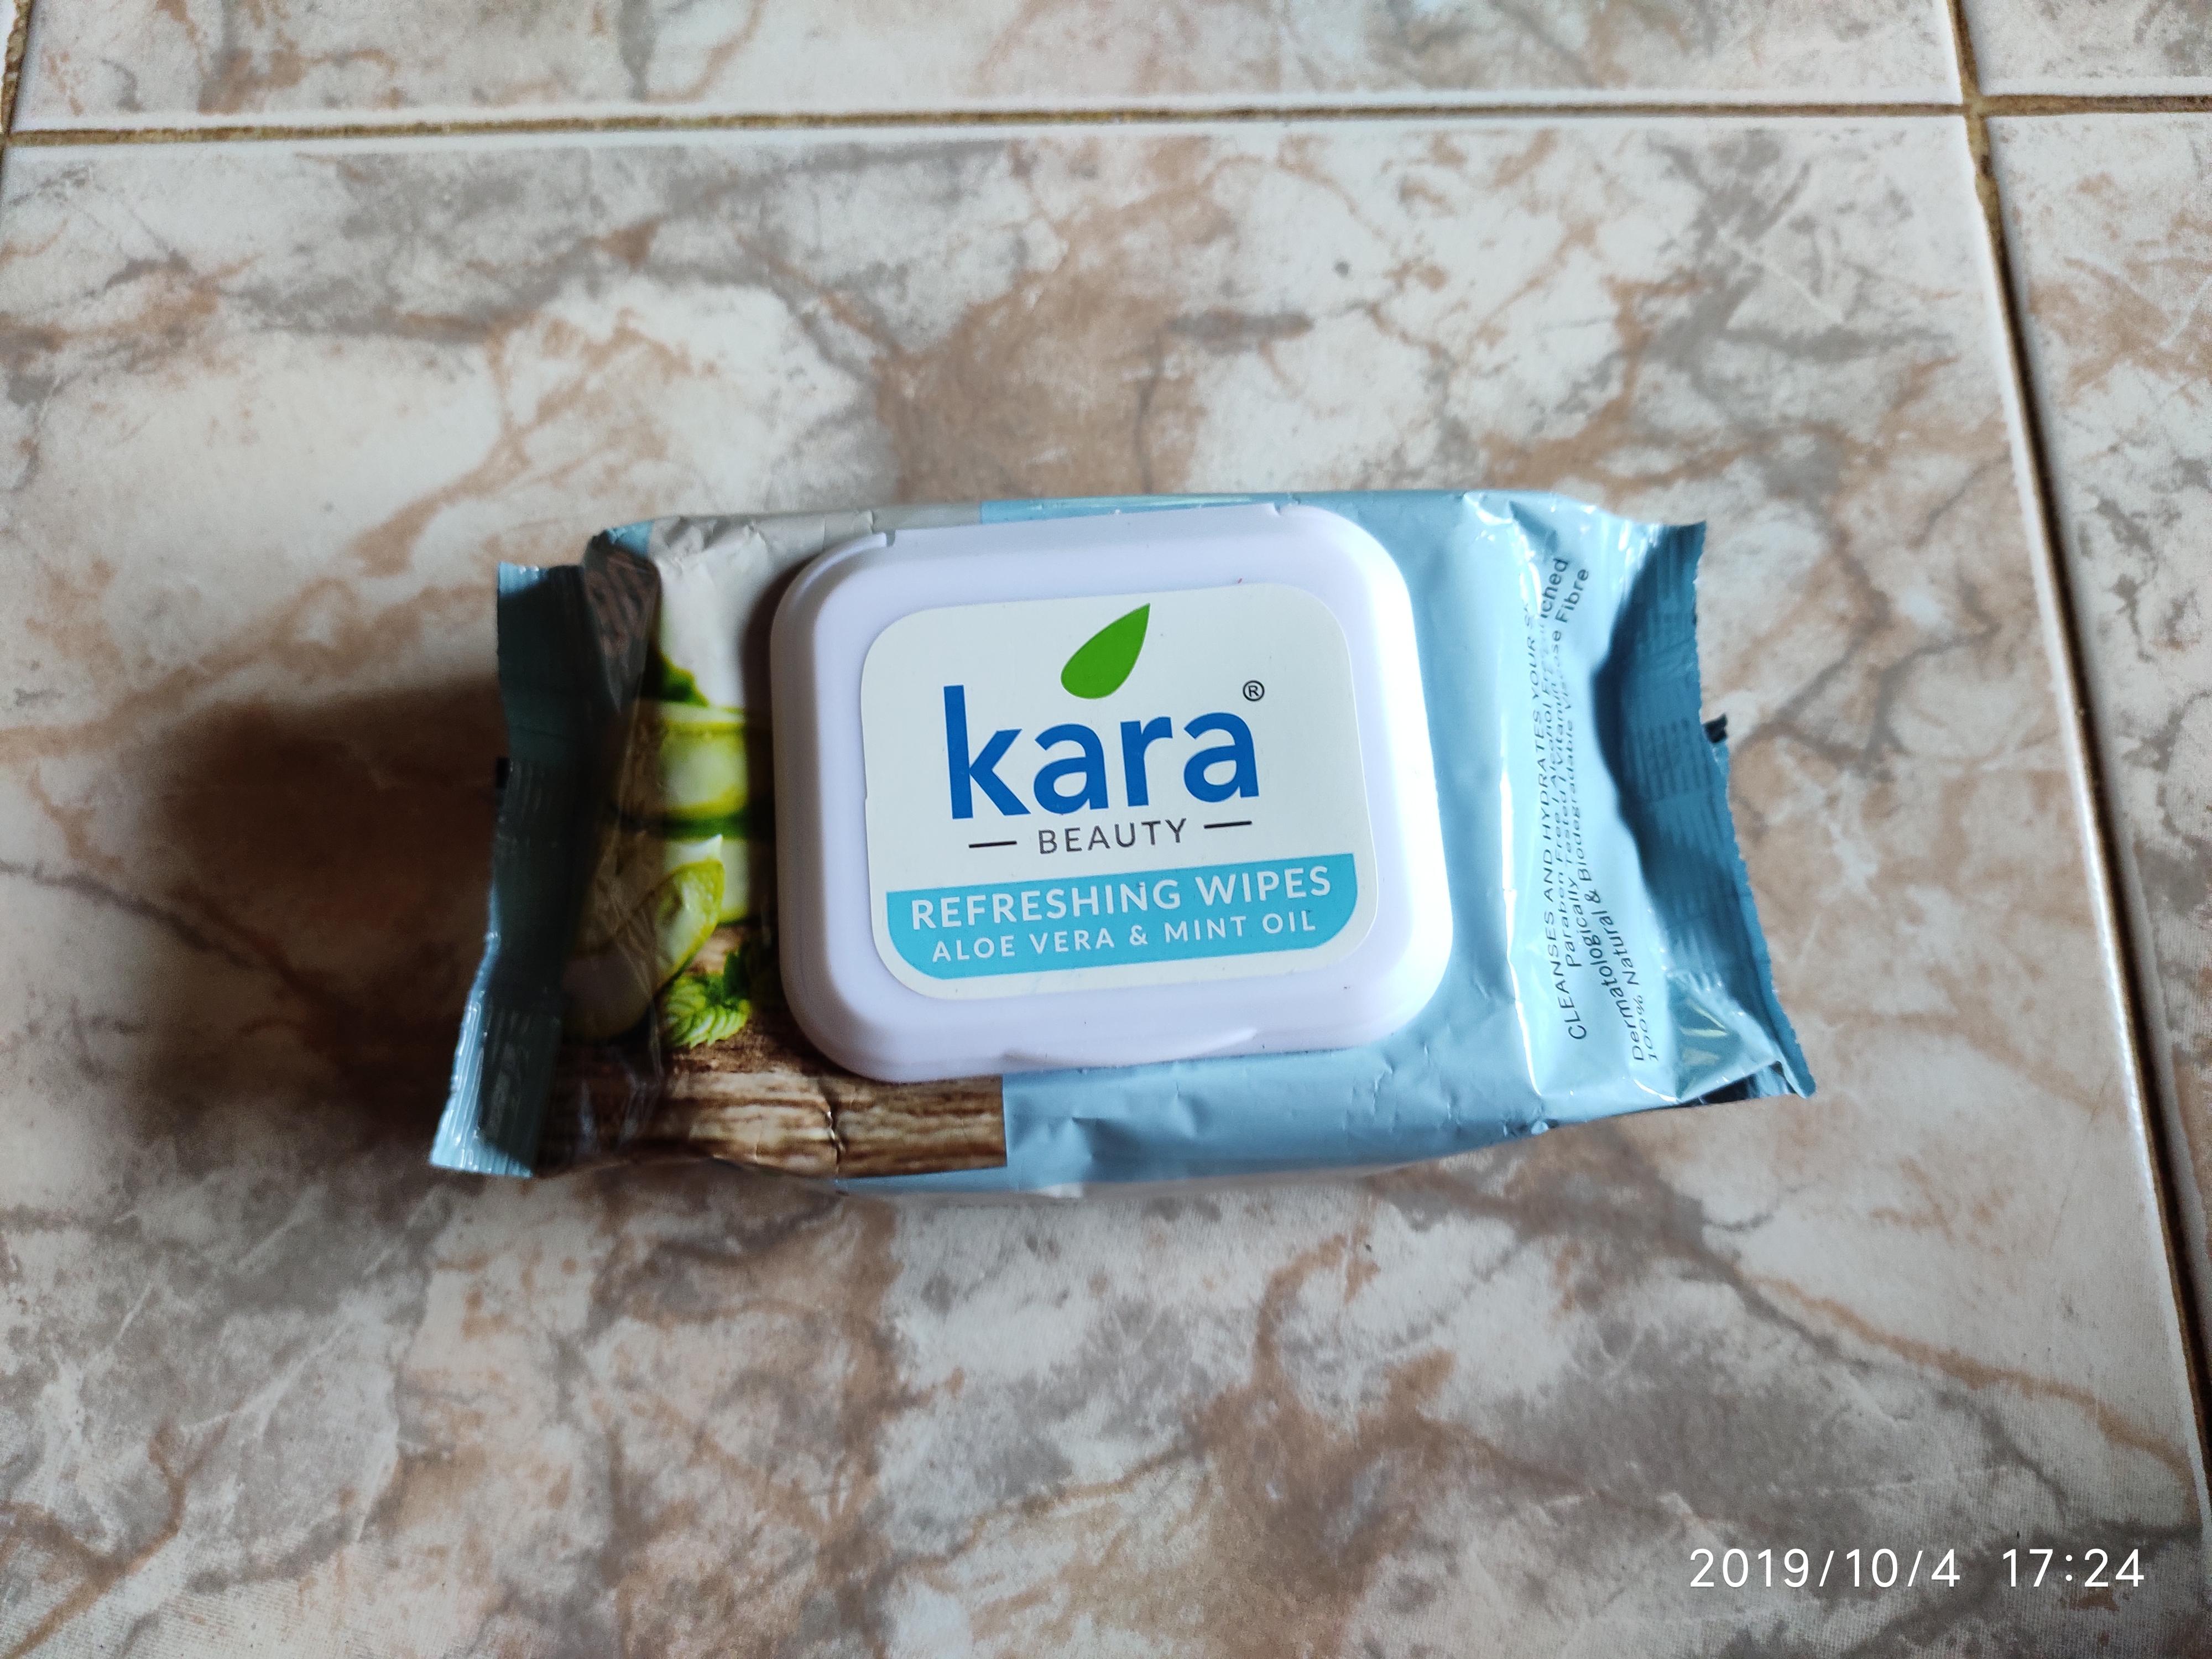 Kara Face Wipes-Refreshing and convenient!!-By latha_selvaraj